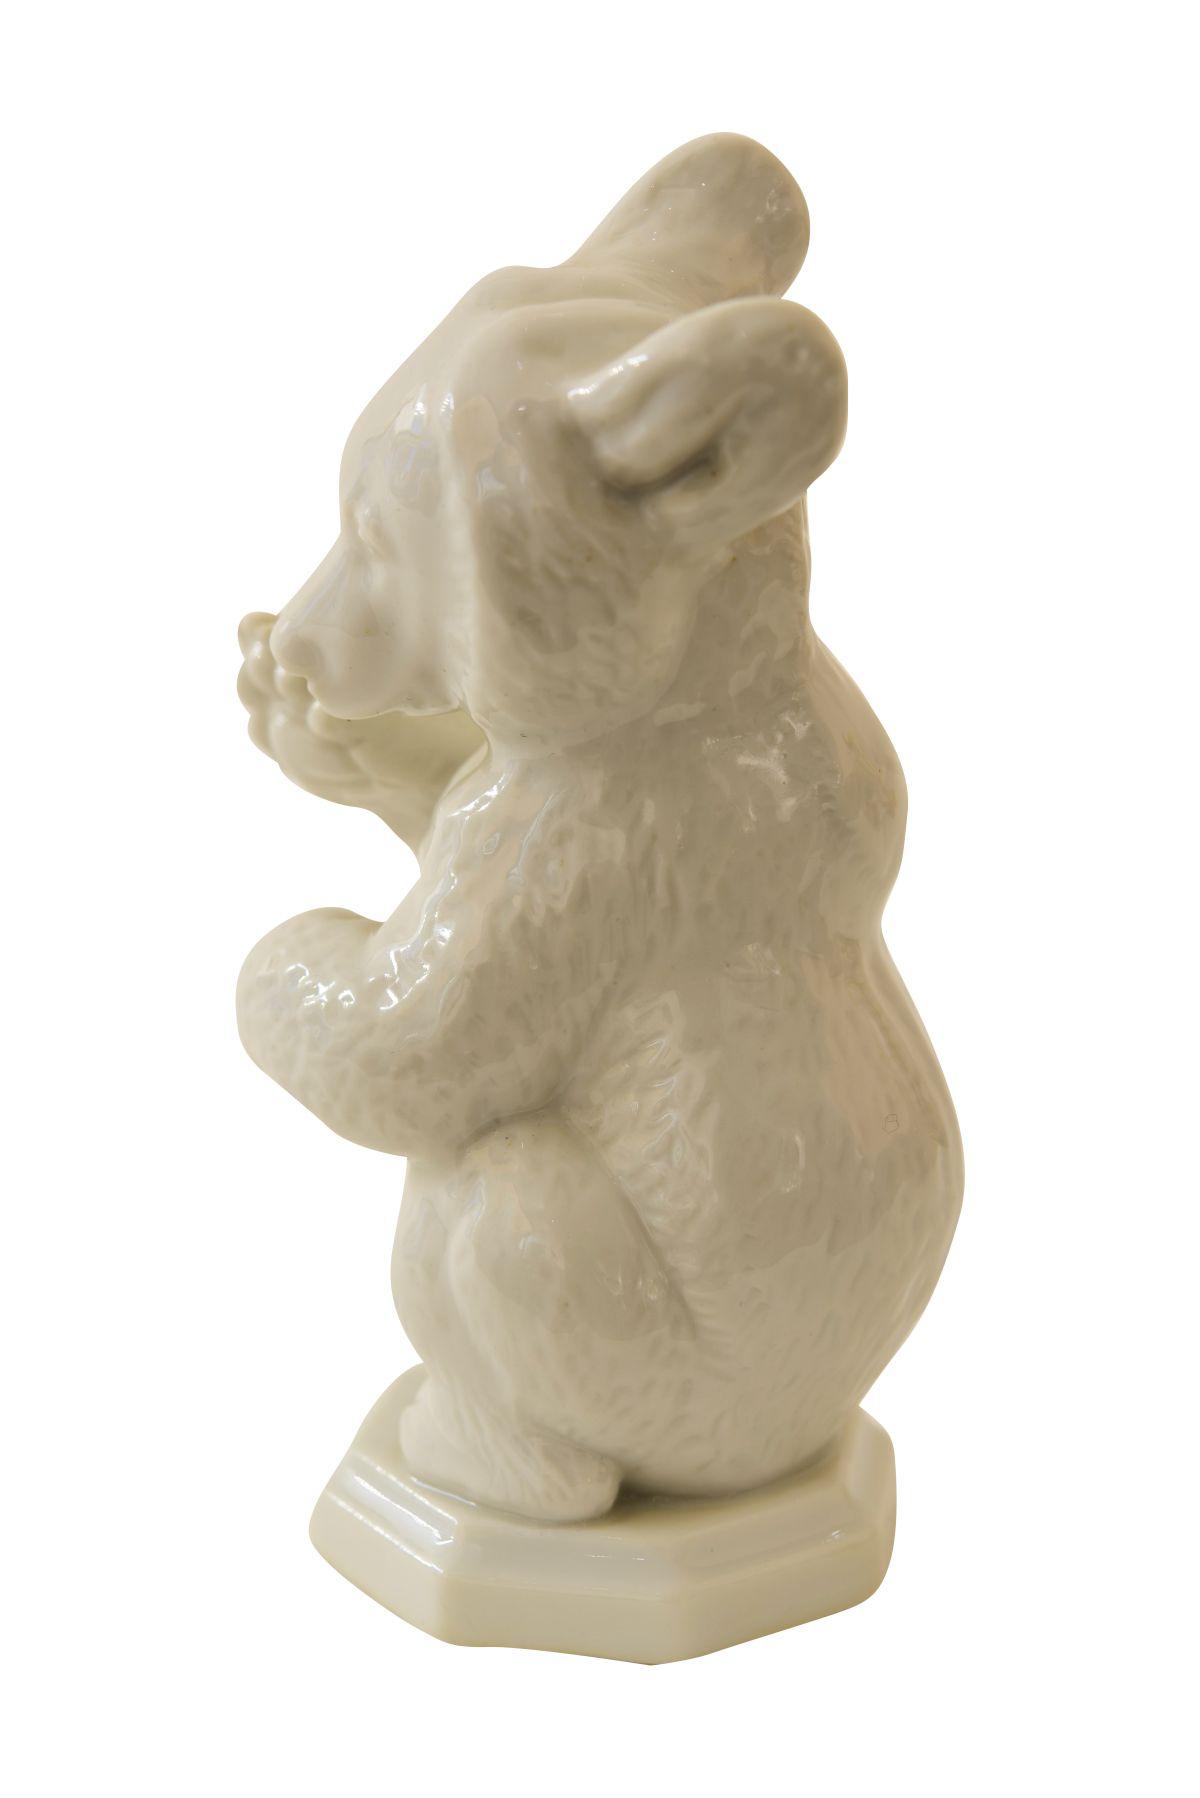 #188 Bear begging Allach porcelain manufactory, Munich | Image